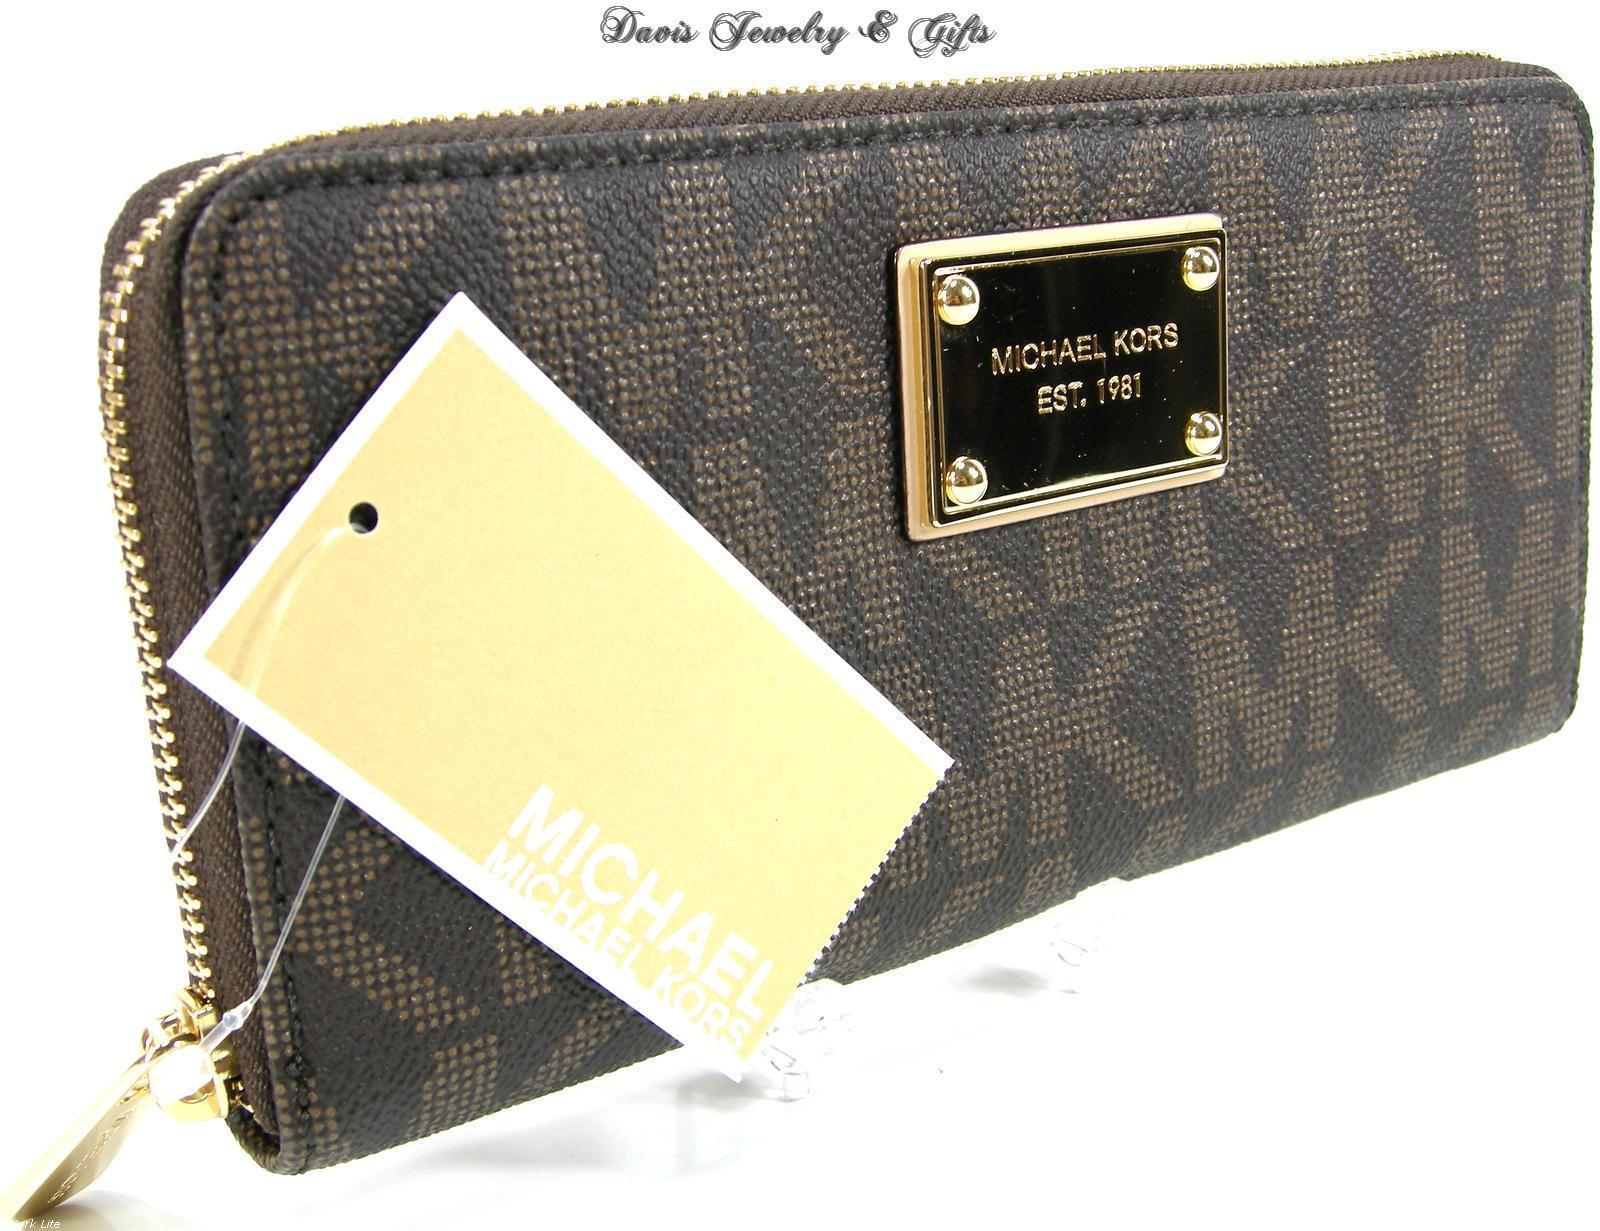 67abfc2addfaa S l1600. S l1600. Previous. Michael Kors MK Logo Wallet Purse Hand Bag  Genuine Brown Leather Jet Set NWT